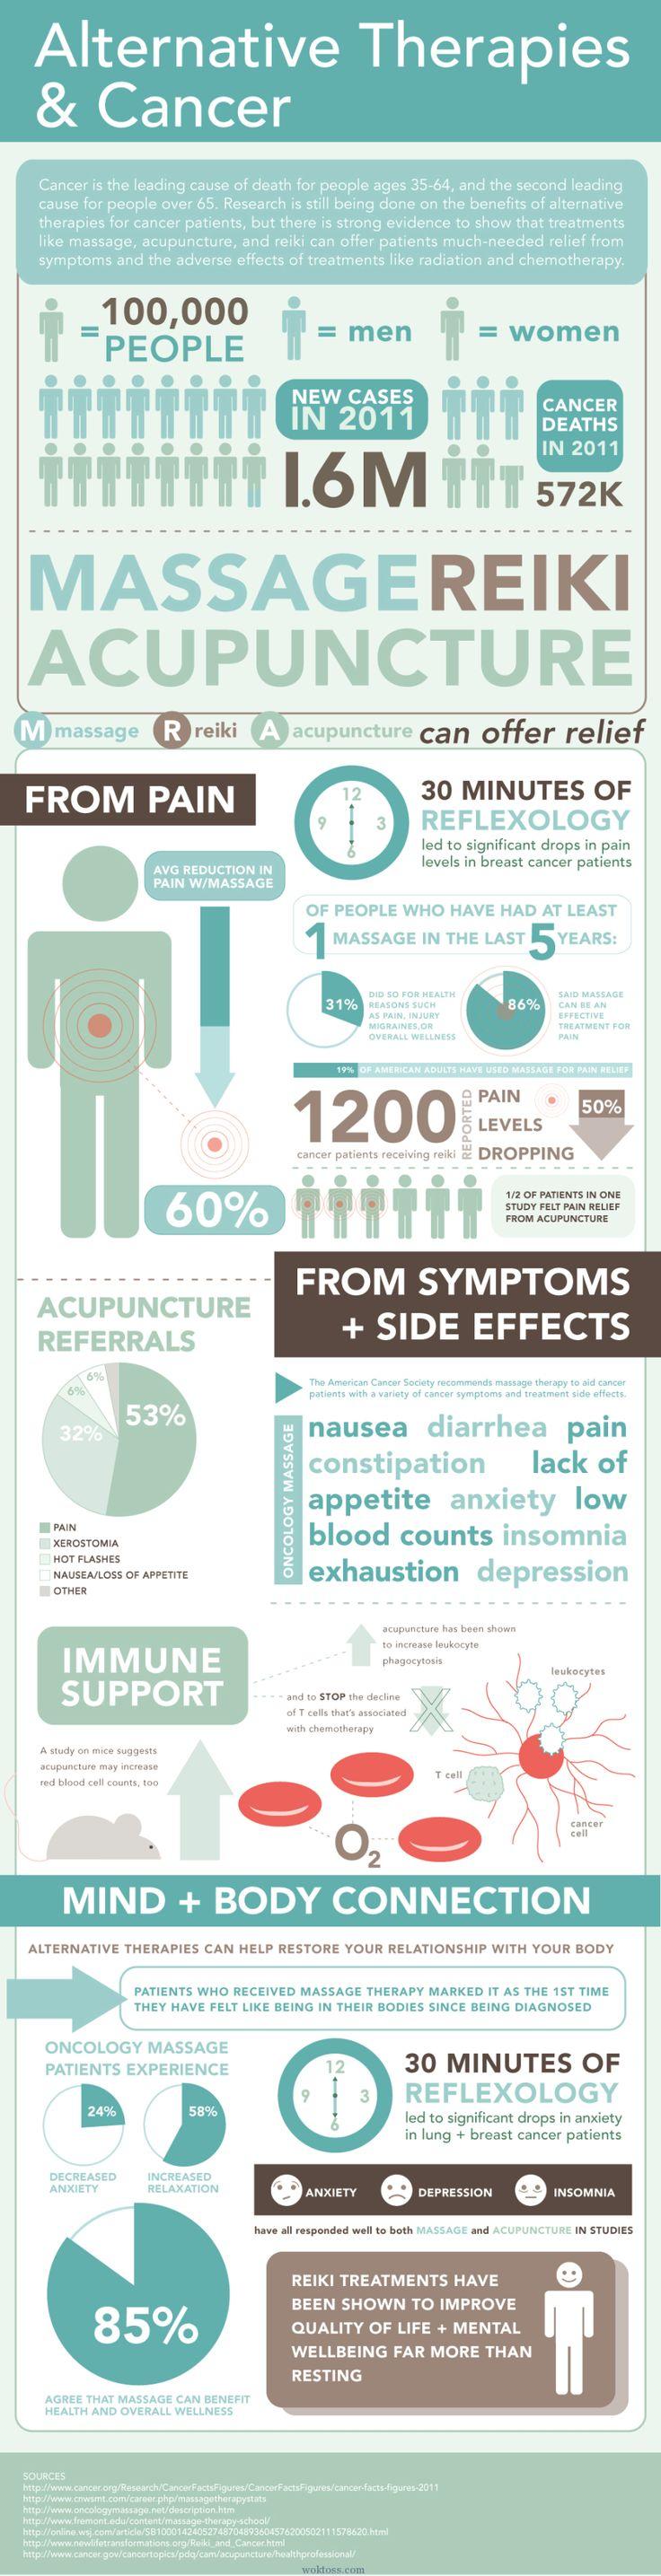 alternative-therapies--cancer infographic on woktoss.com